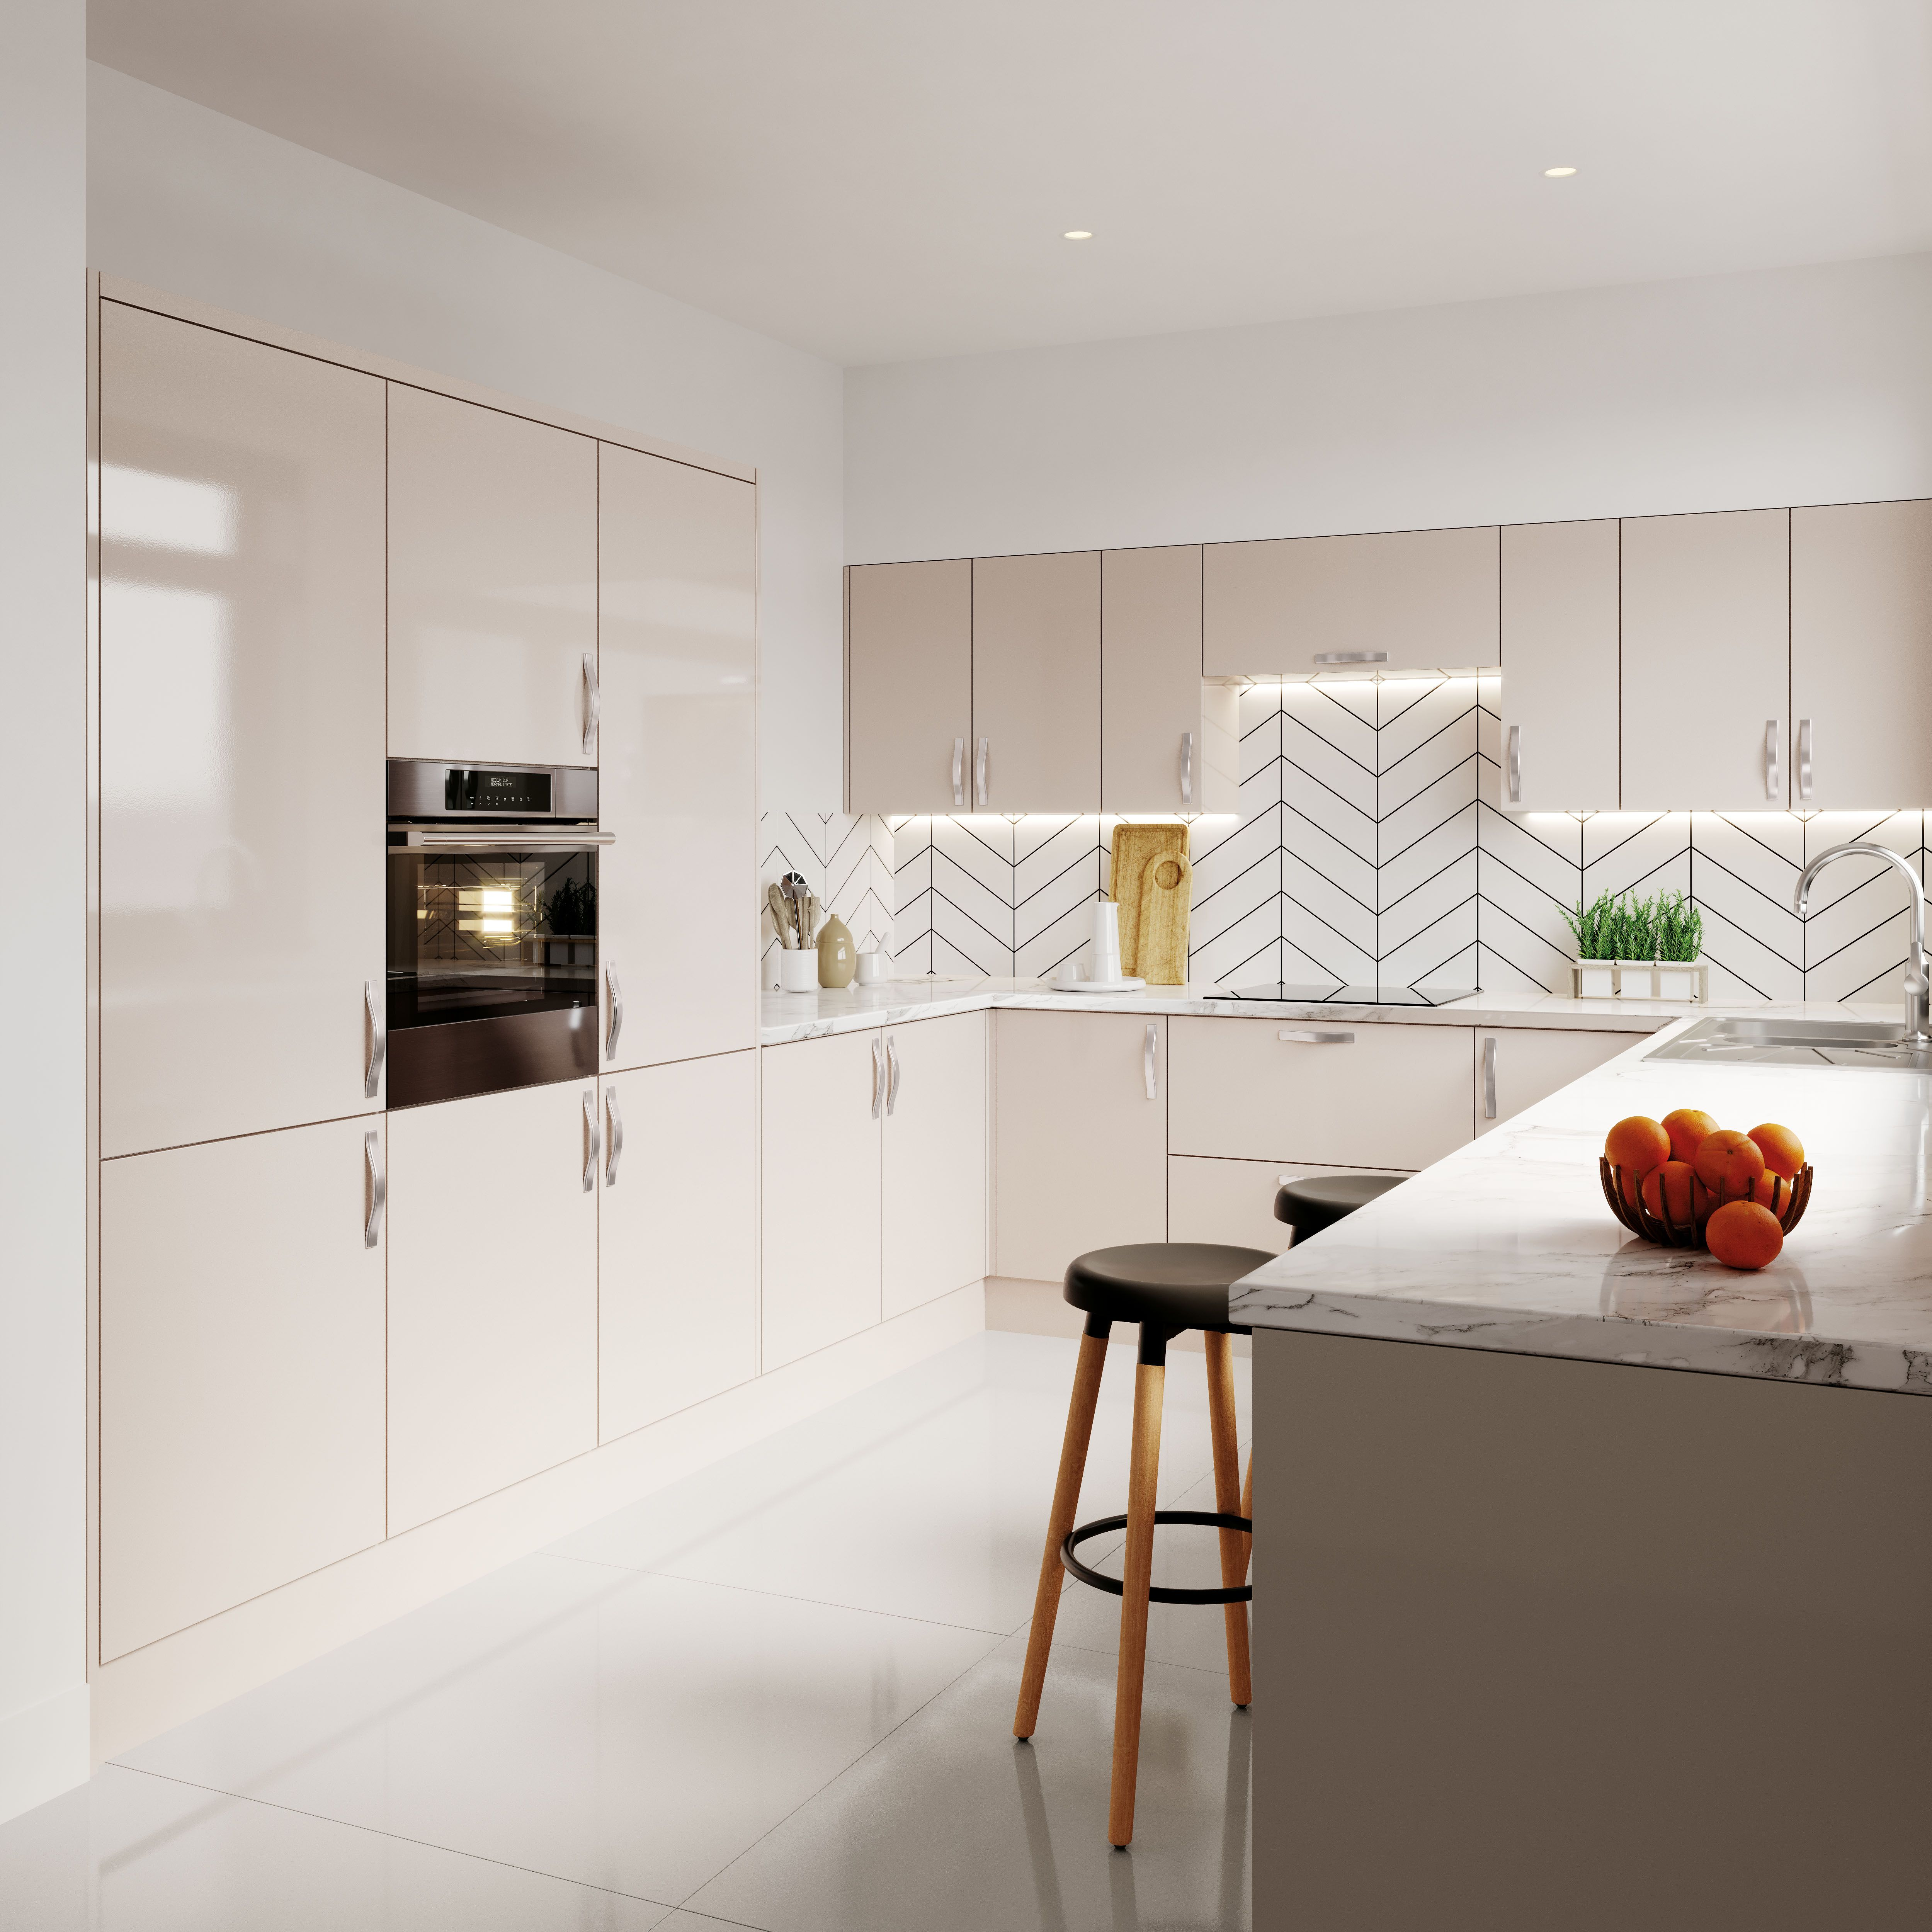 Salcombe Gloss Simple Kitchen Cabinets Kitchen Cabinet Door Styles Modern Kitchen Cabinet Design